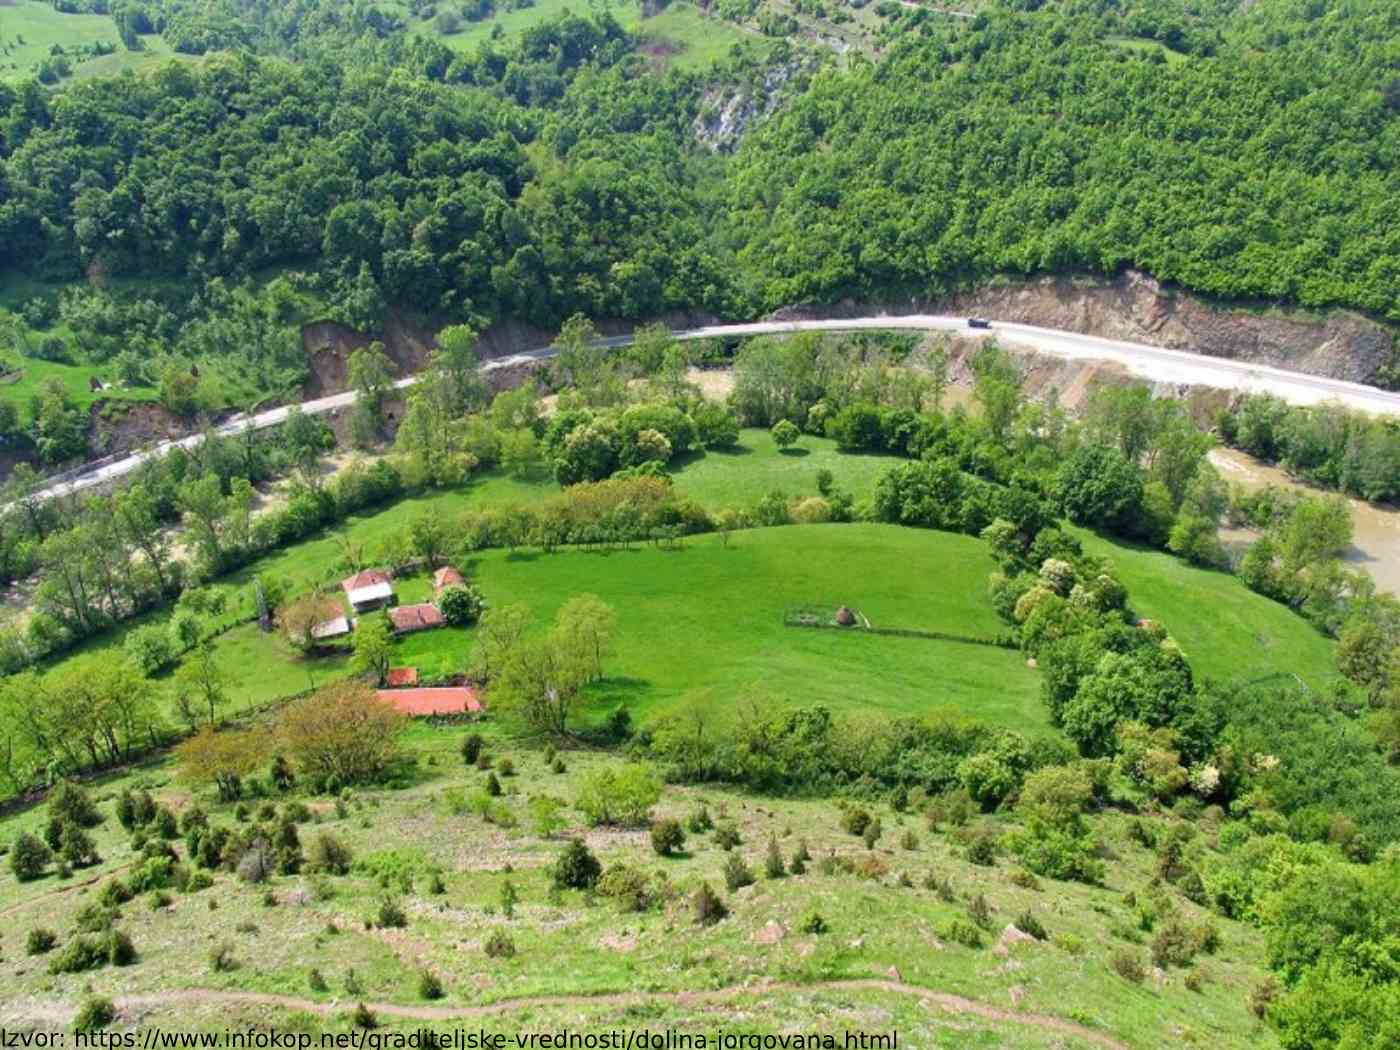 dolina-jorgovana-ibar